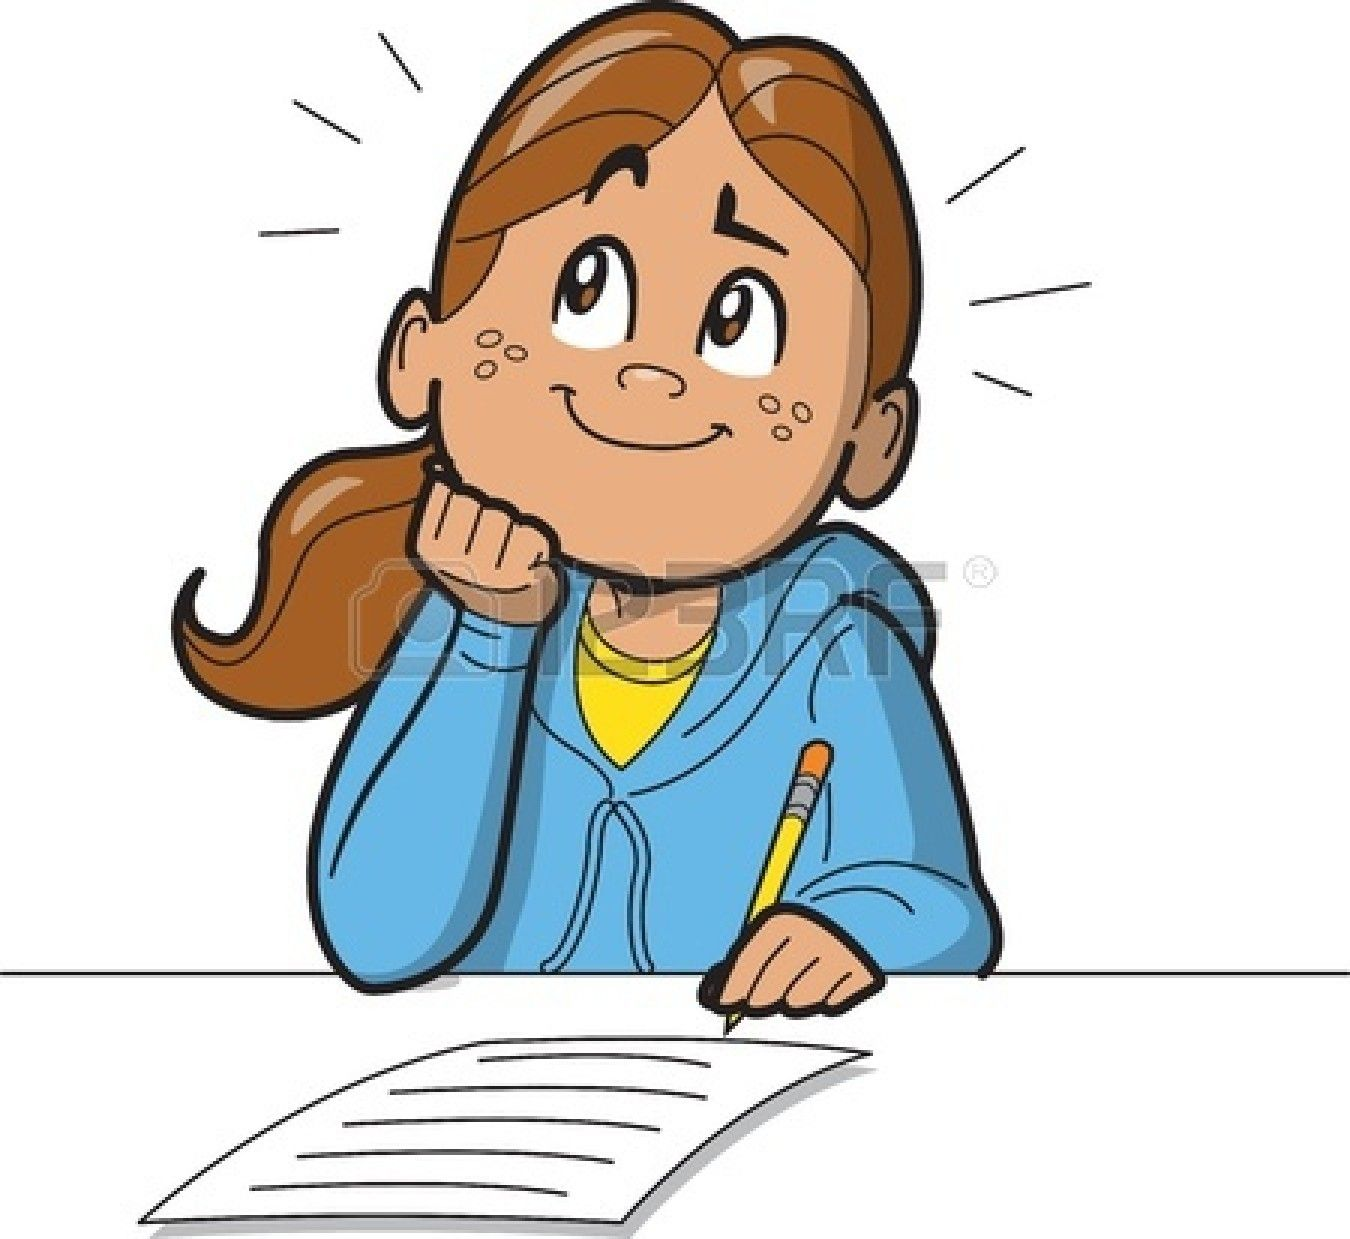 clipart school test - photo #23